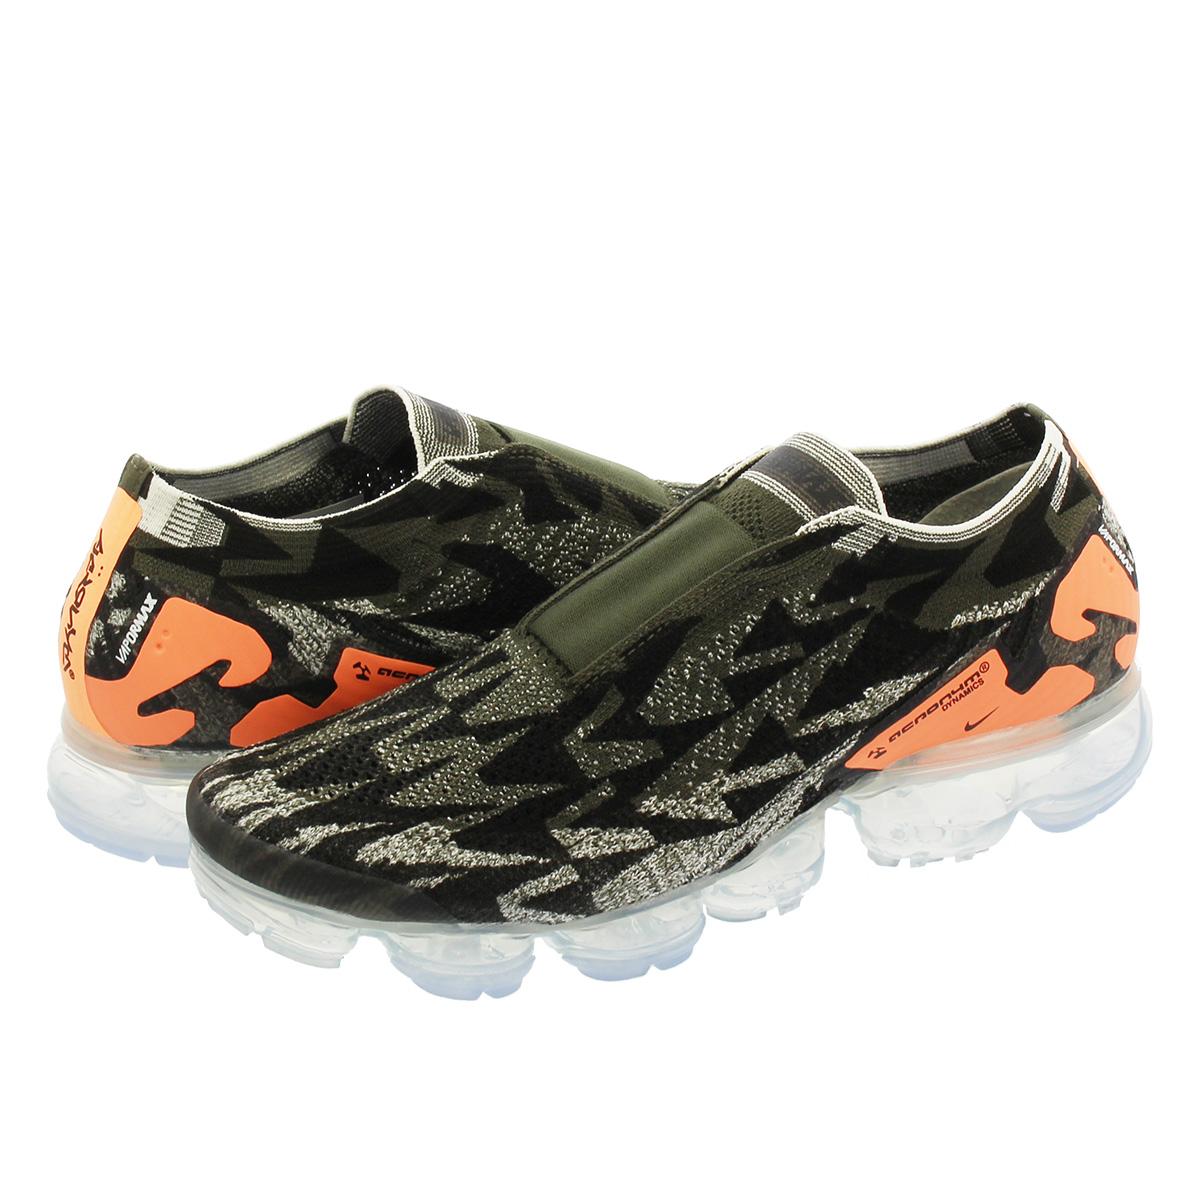 f7b7757d560 SELECT SHOP LOWTEX  NIKE X ACRONYM AIR VAPORMAX MOC 2 Nike X  アクロニウムエアヴェイパーマックスモック 2 SAIL CARGO KHAKI DARK STUCCO aq0996-102